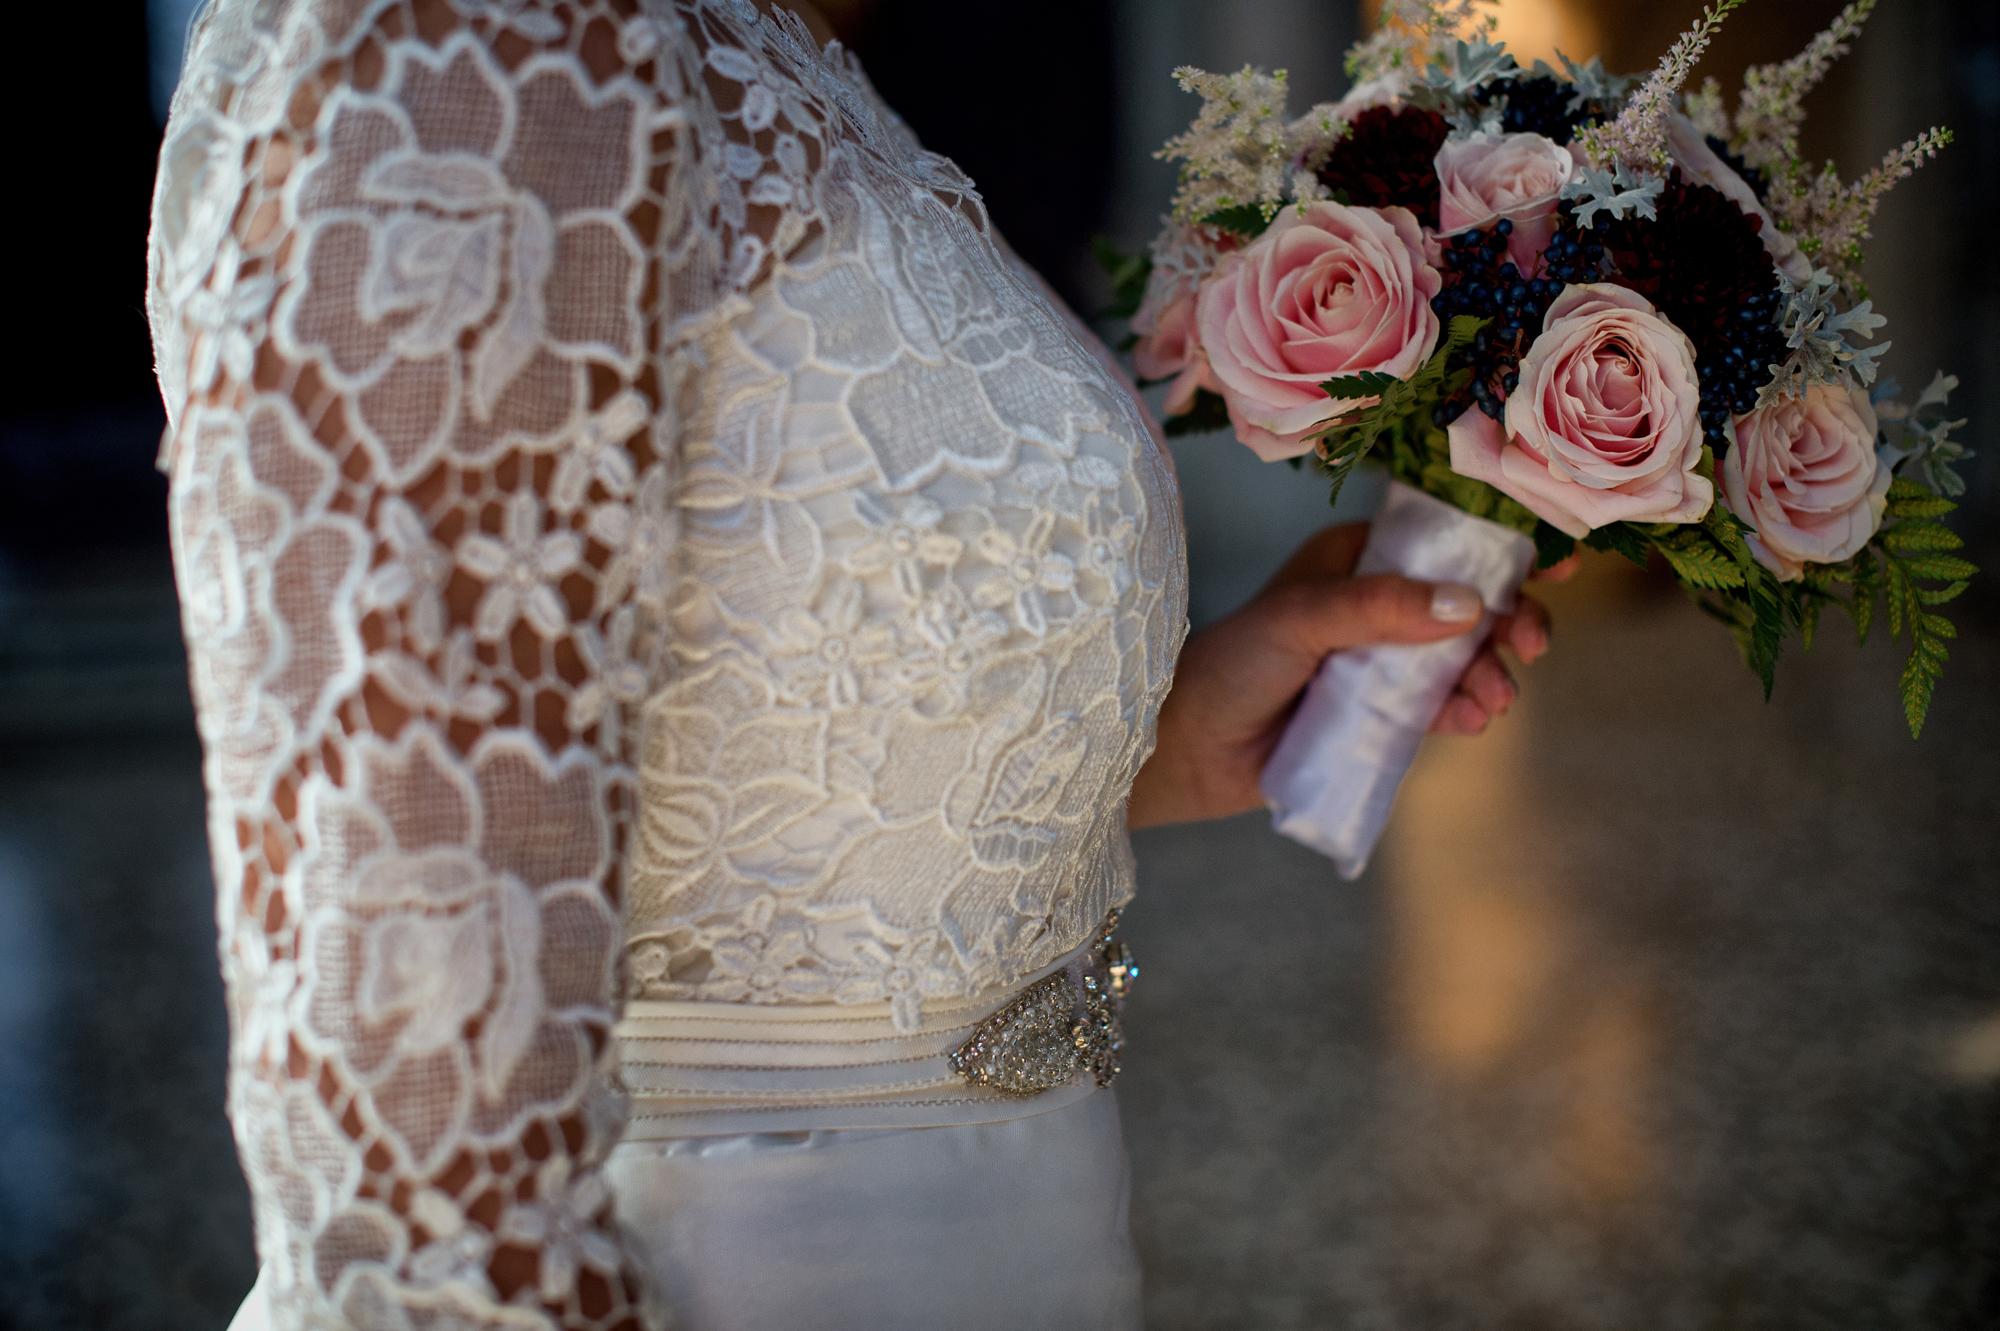 venezia matrimonio simbolico fotografia carmini laure jacquemin fotografo (57)